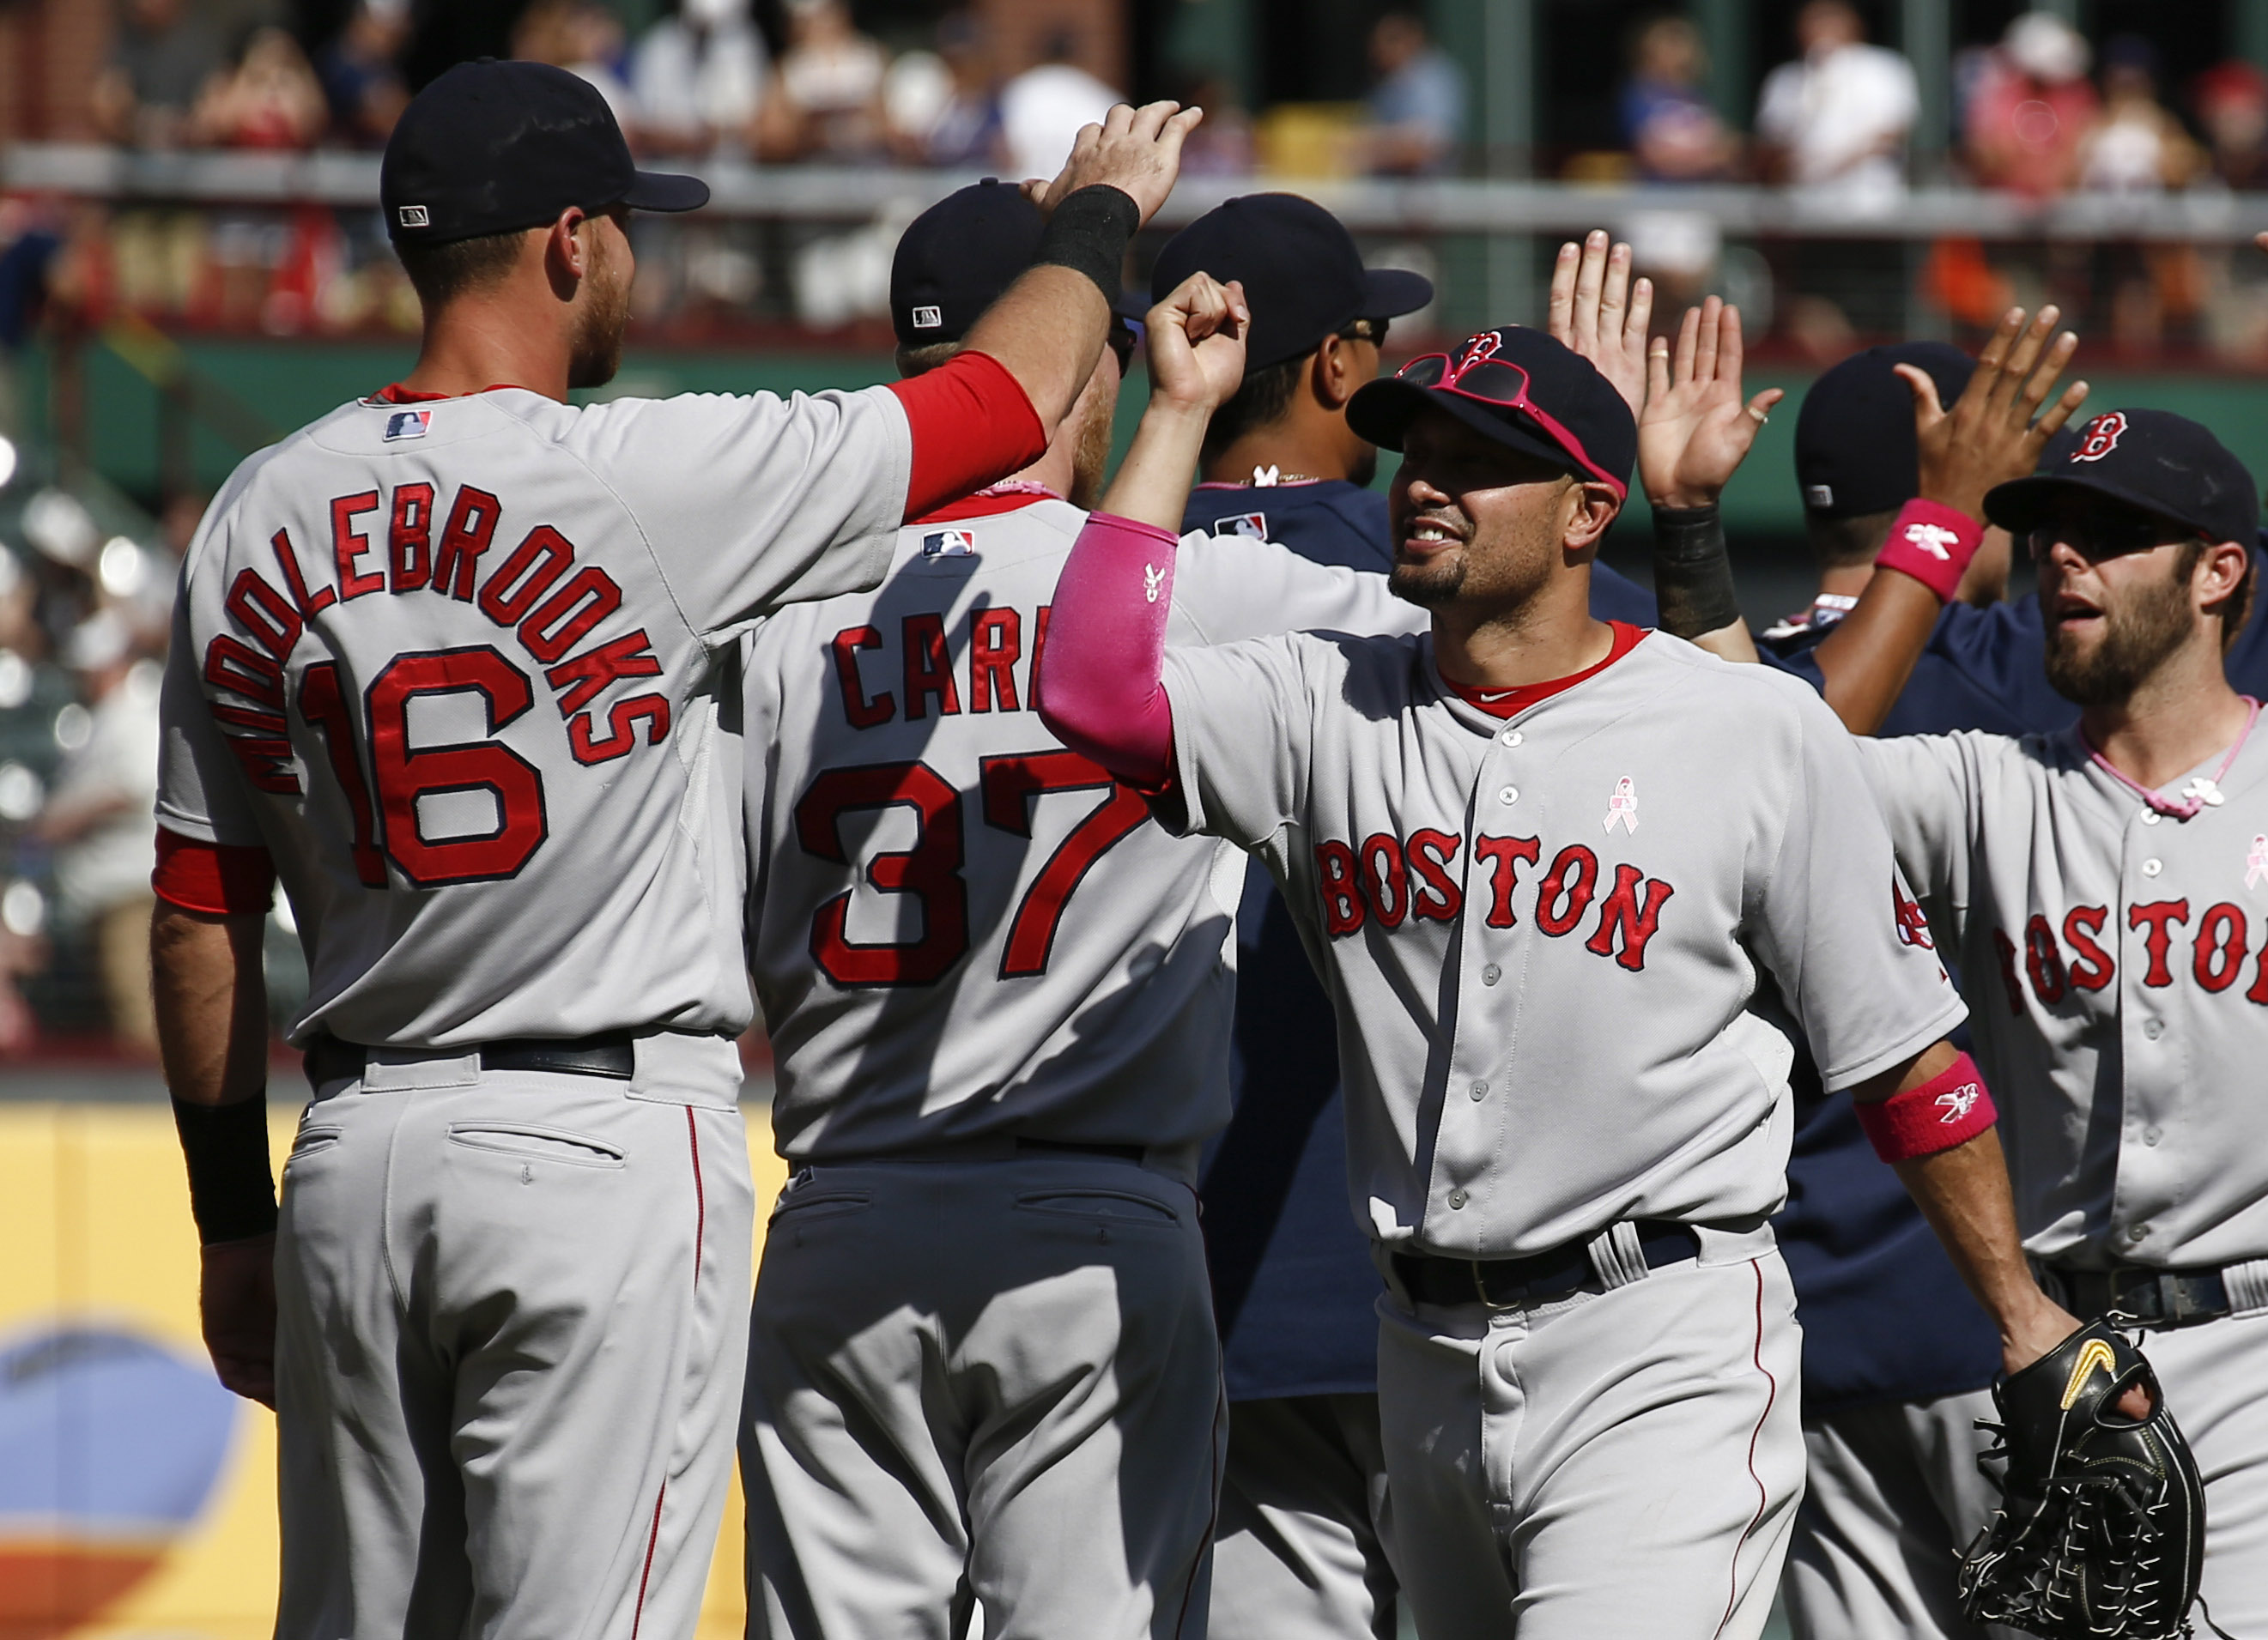 2014-05-11T222407Z_2107130430_NOCID_RTRMADP_3_MLB-BOSTON-RED-SOX-AT-TEXAS-RANGERS.jpg